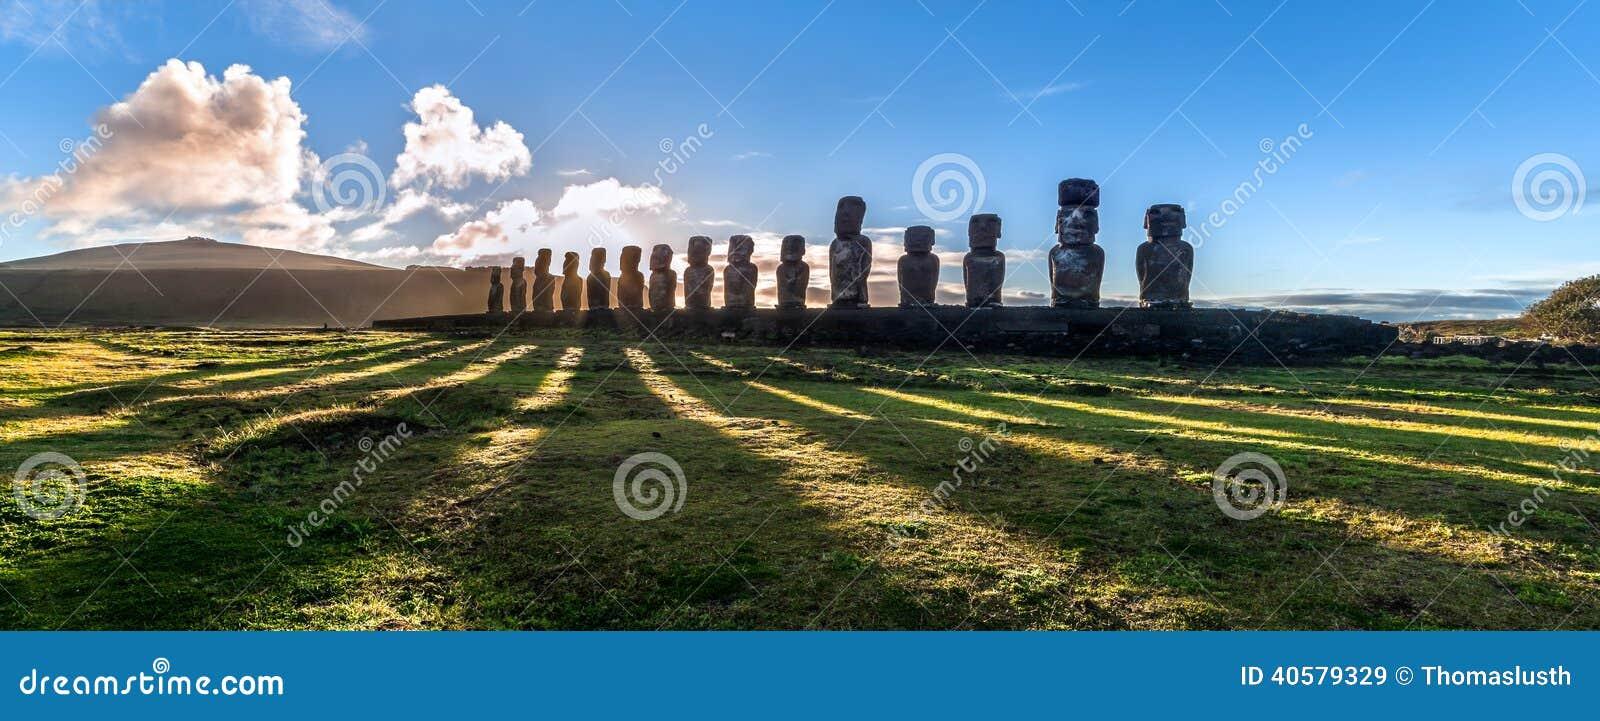 Download Ahu Tongariki на восходе солнца Стоковое Изображение - изображение насчитывающей внушительное, наследие: 40579329